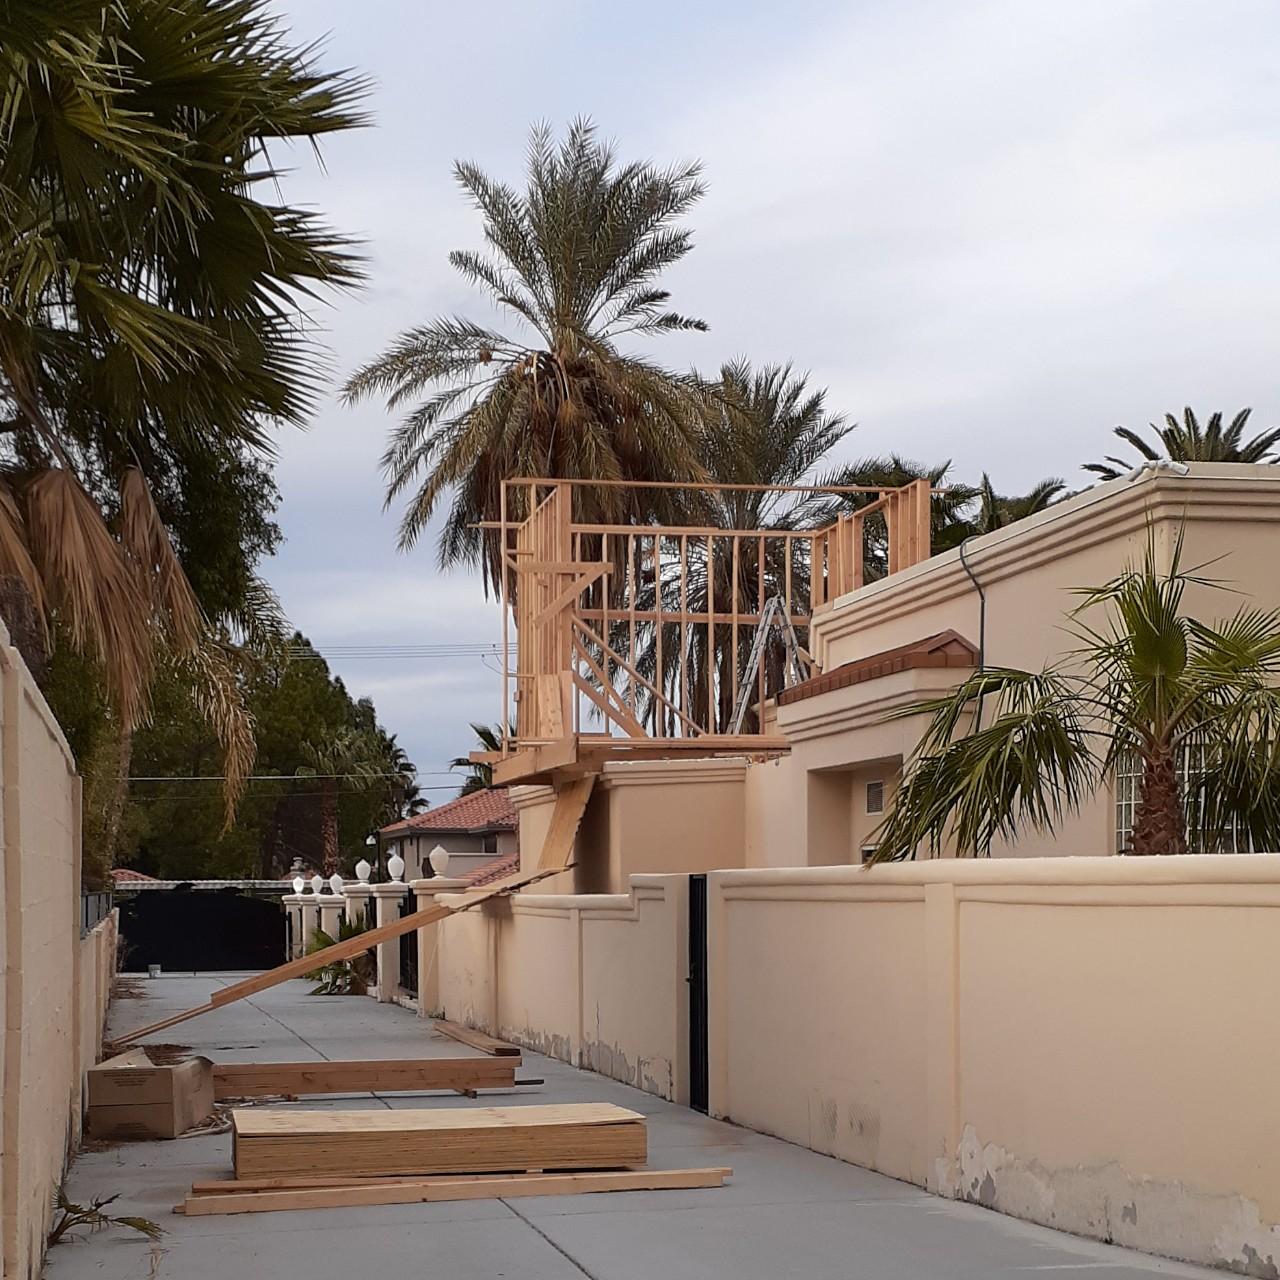 carpentry-wood-framing-second-floor-home-addition--framing-78